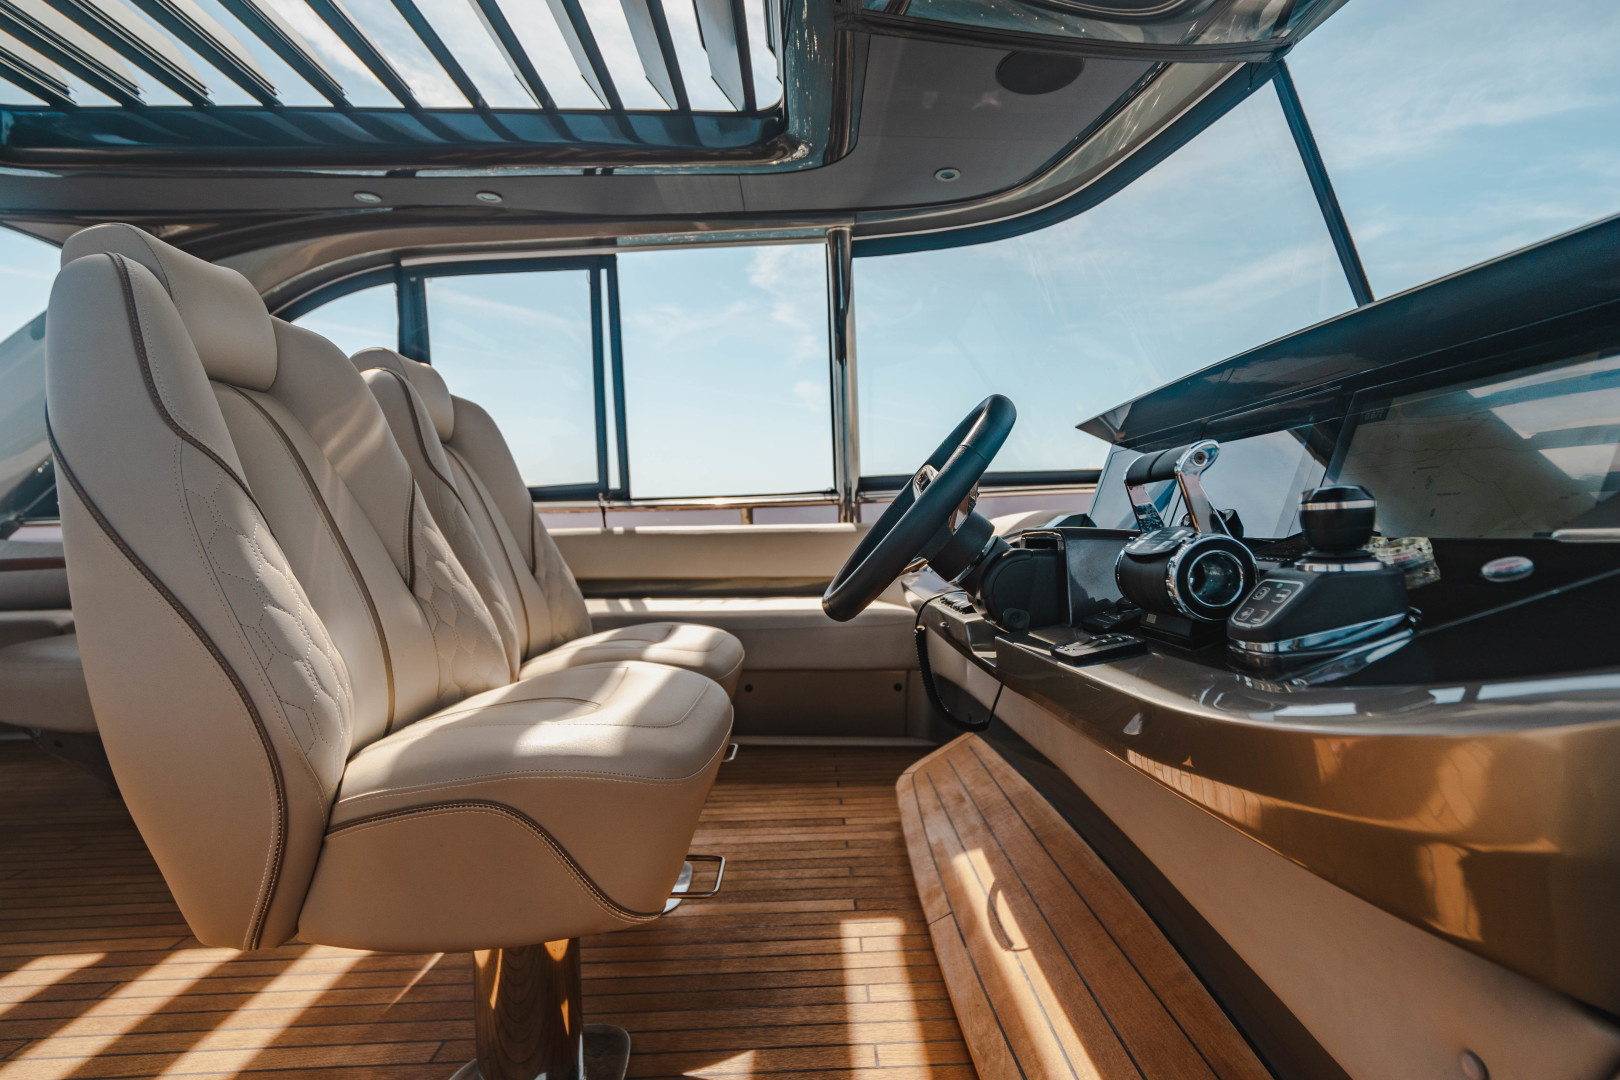 Princess-Y85  2019-Splash Delray Beach-Florida-United States-1631636 | Thumbnail